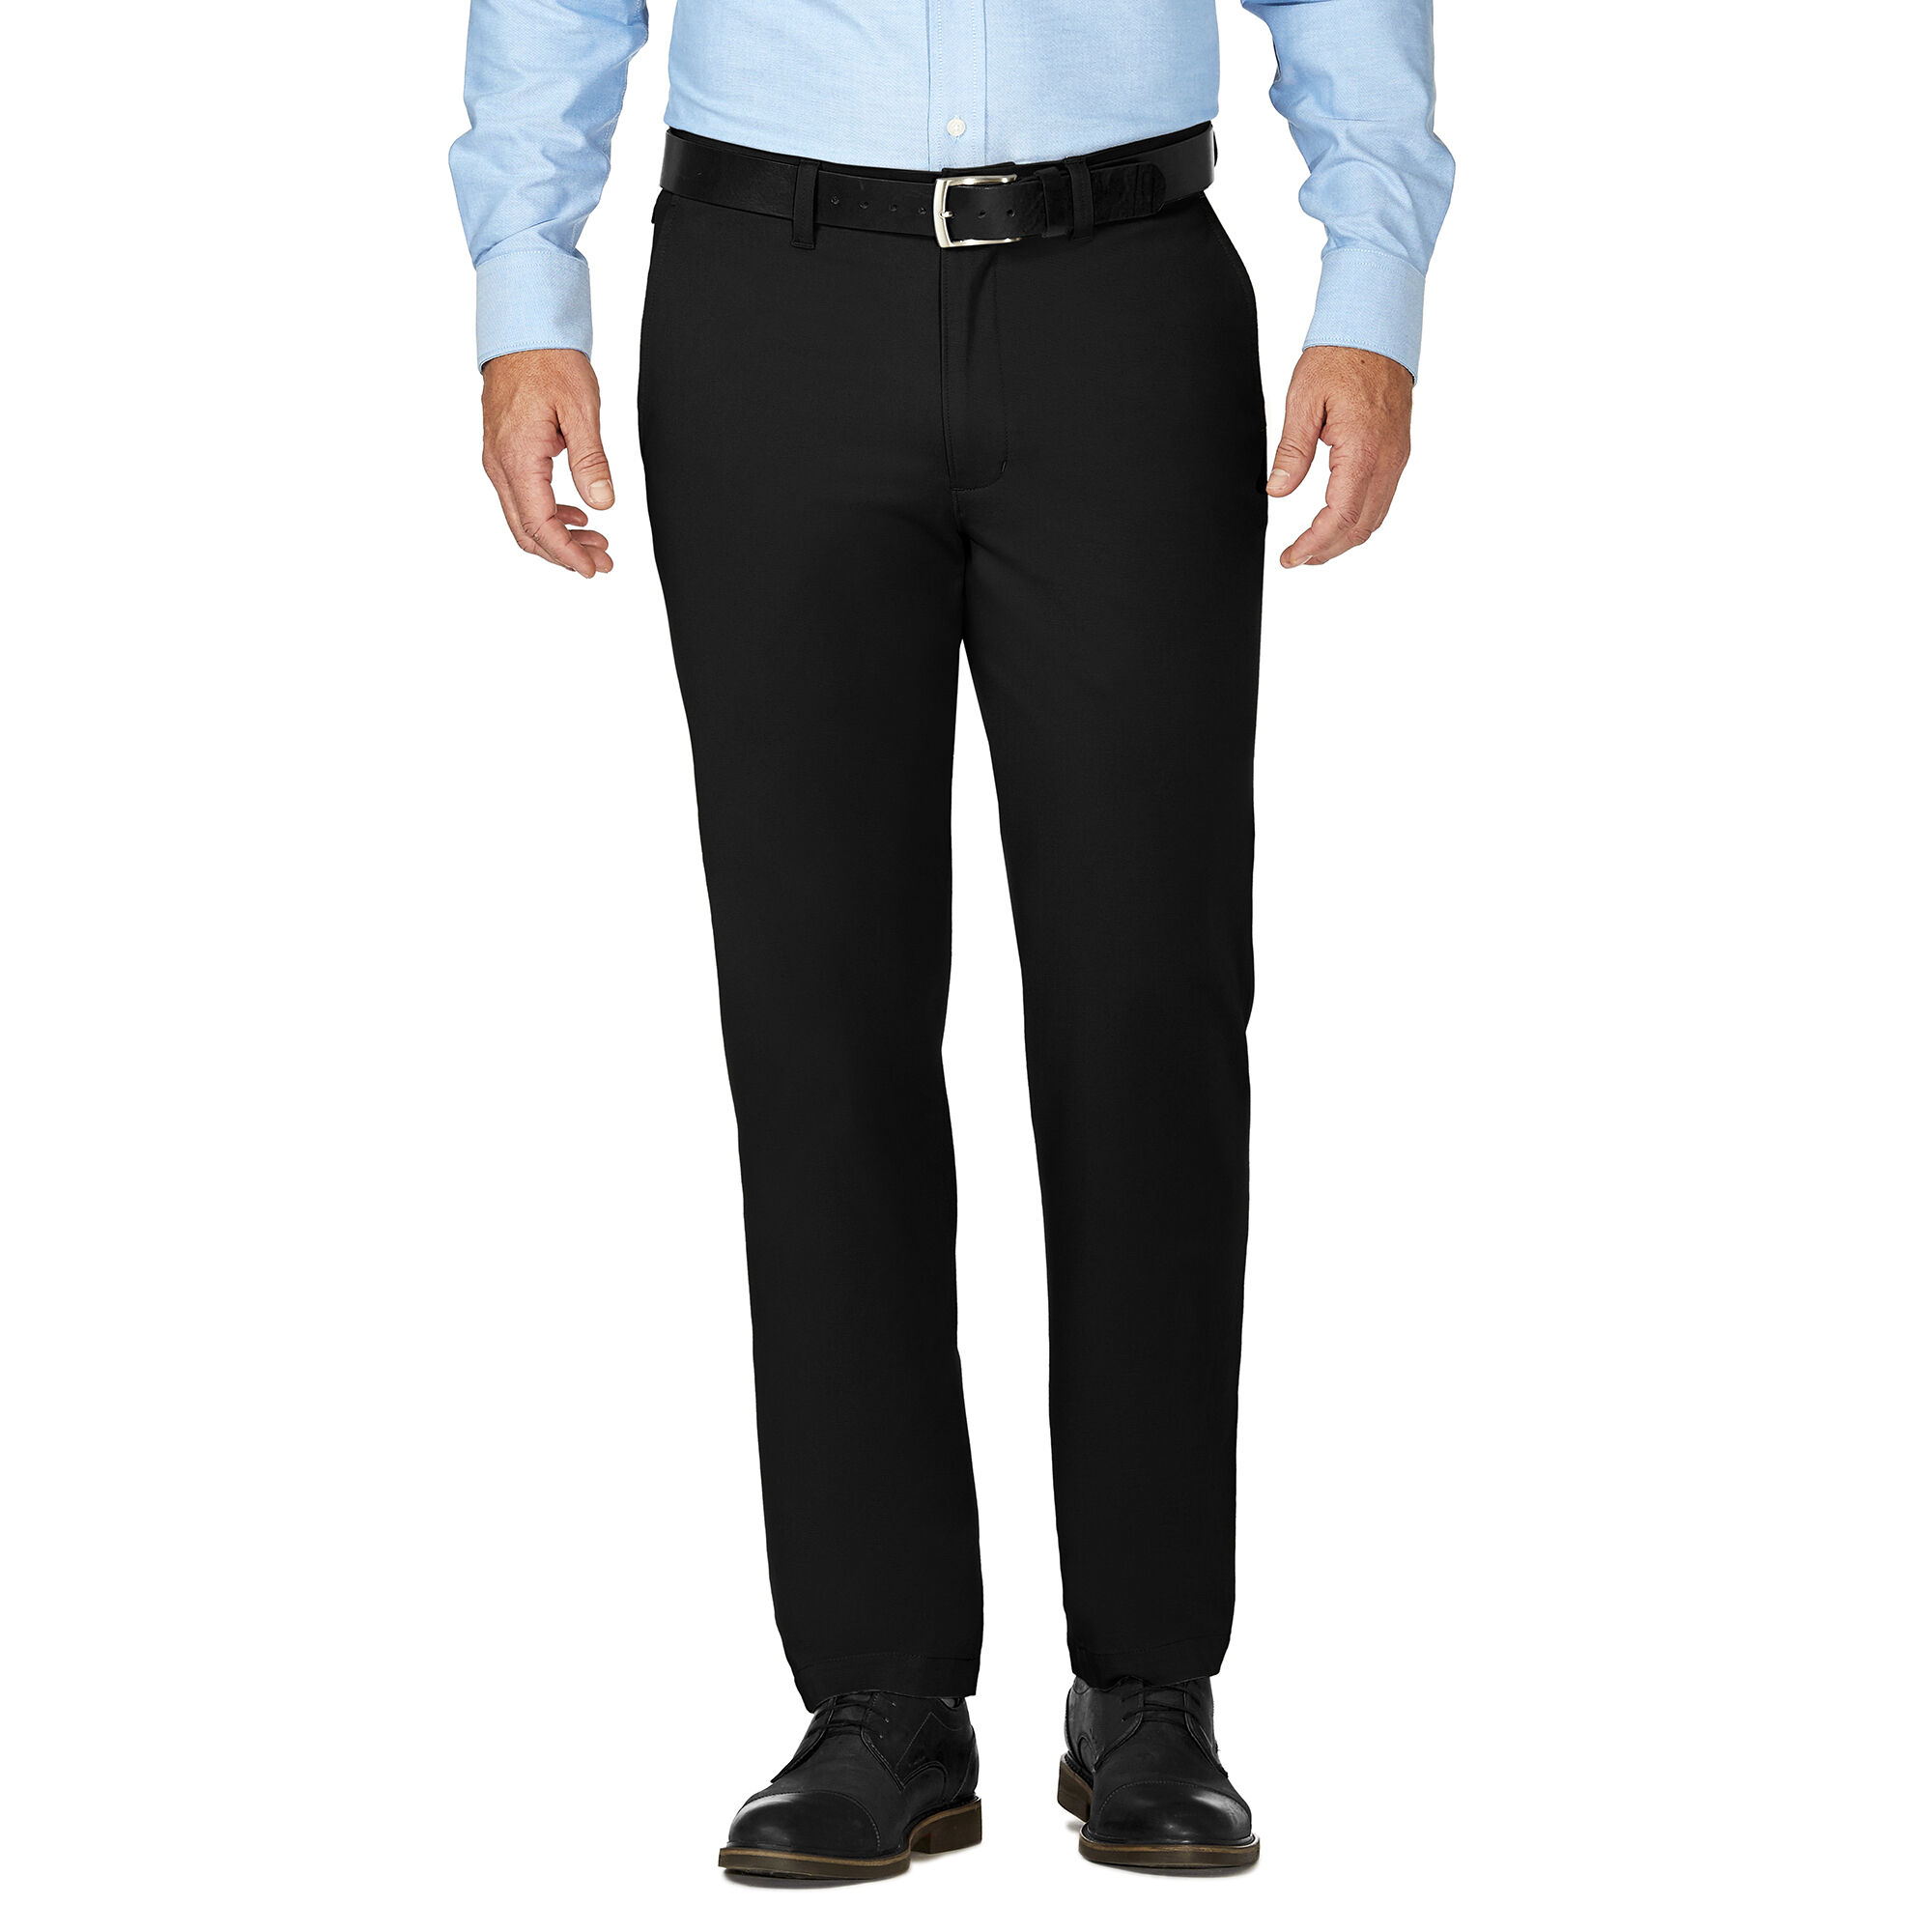 Haggar Mens City Chino Stretch Slim-Fit Flex-Waistband Flat-Front Pant